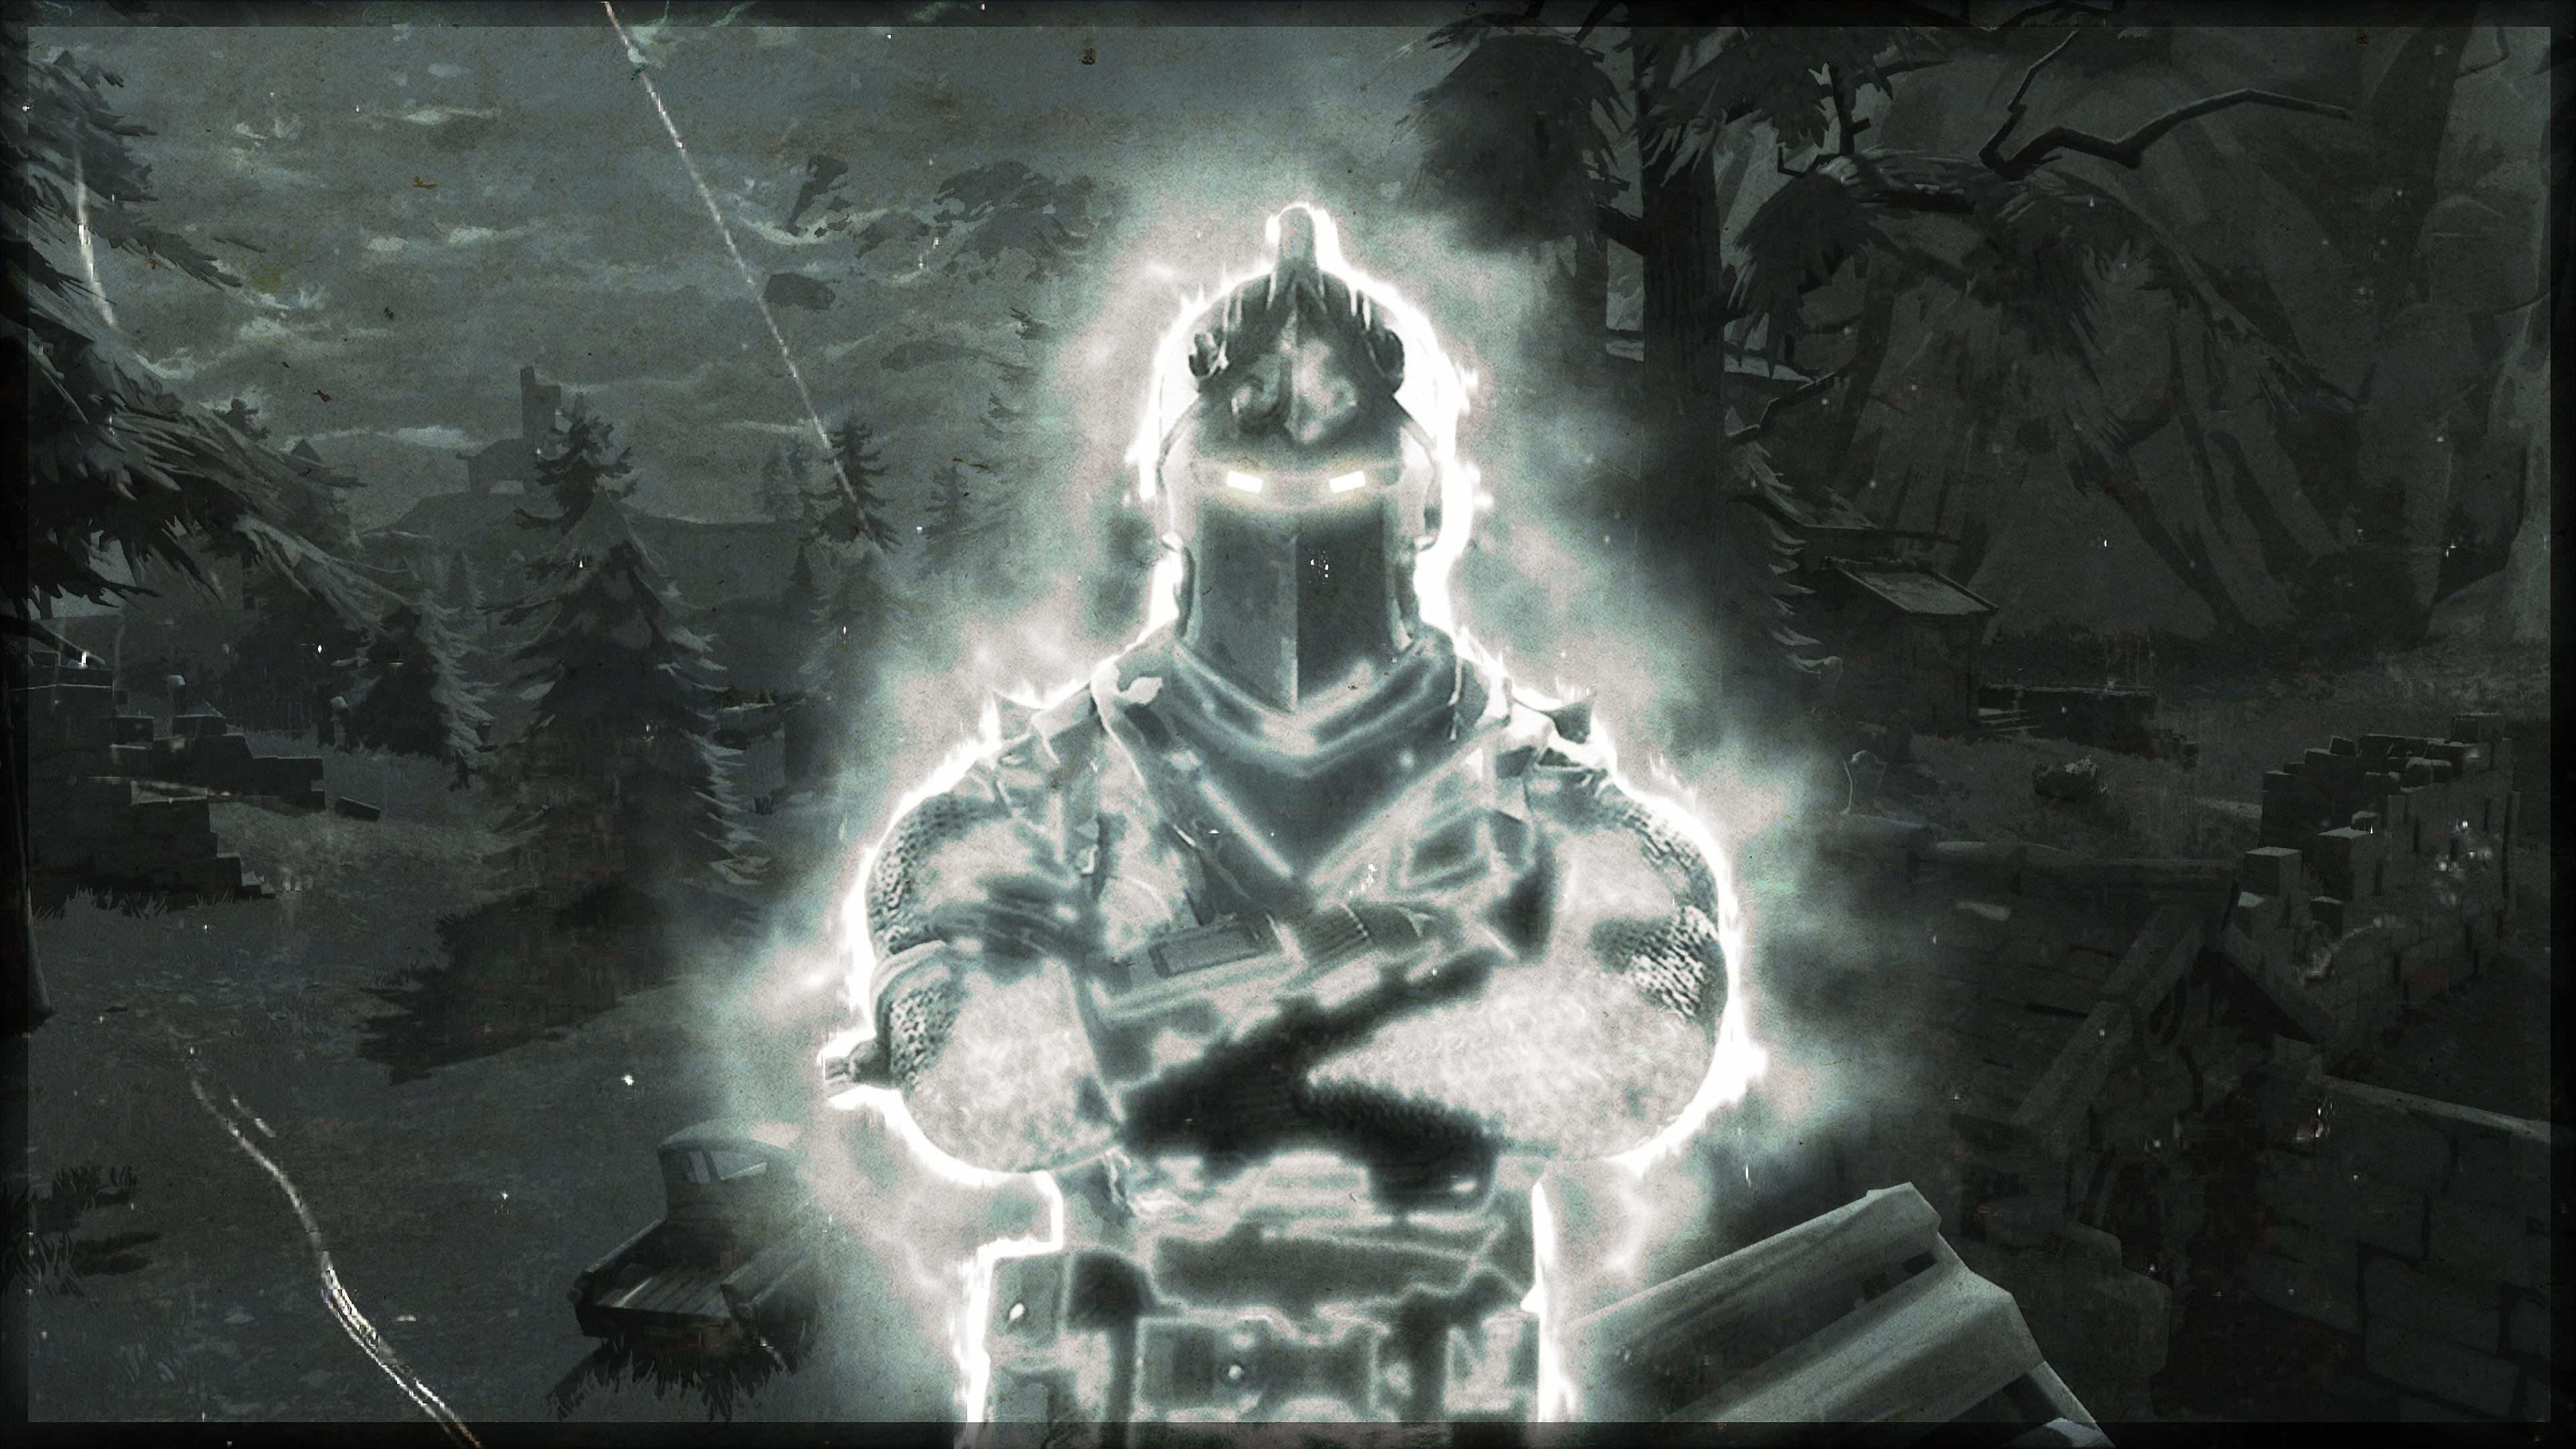 Black Knight 4K 8K HD Fortnite Battle Royale Wallpaper 3840x2160